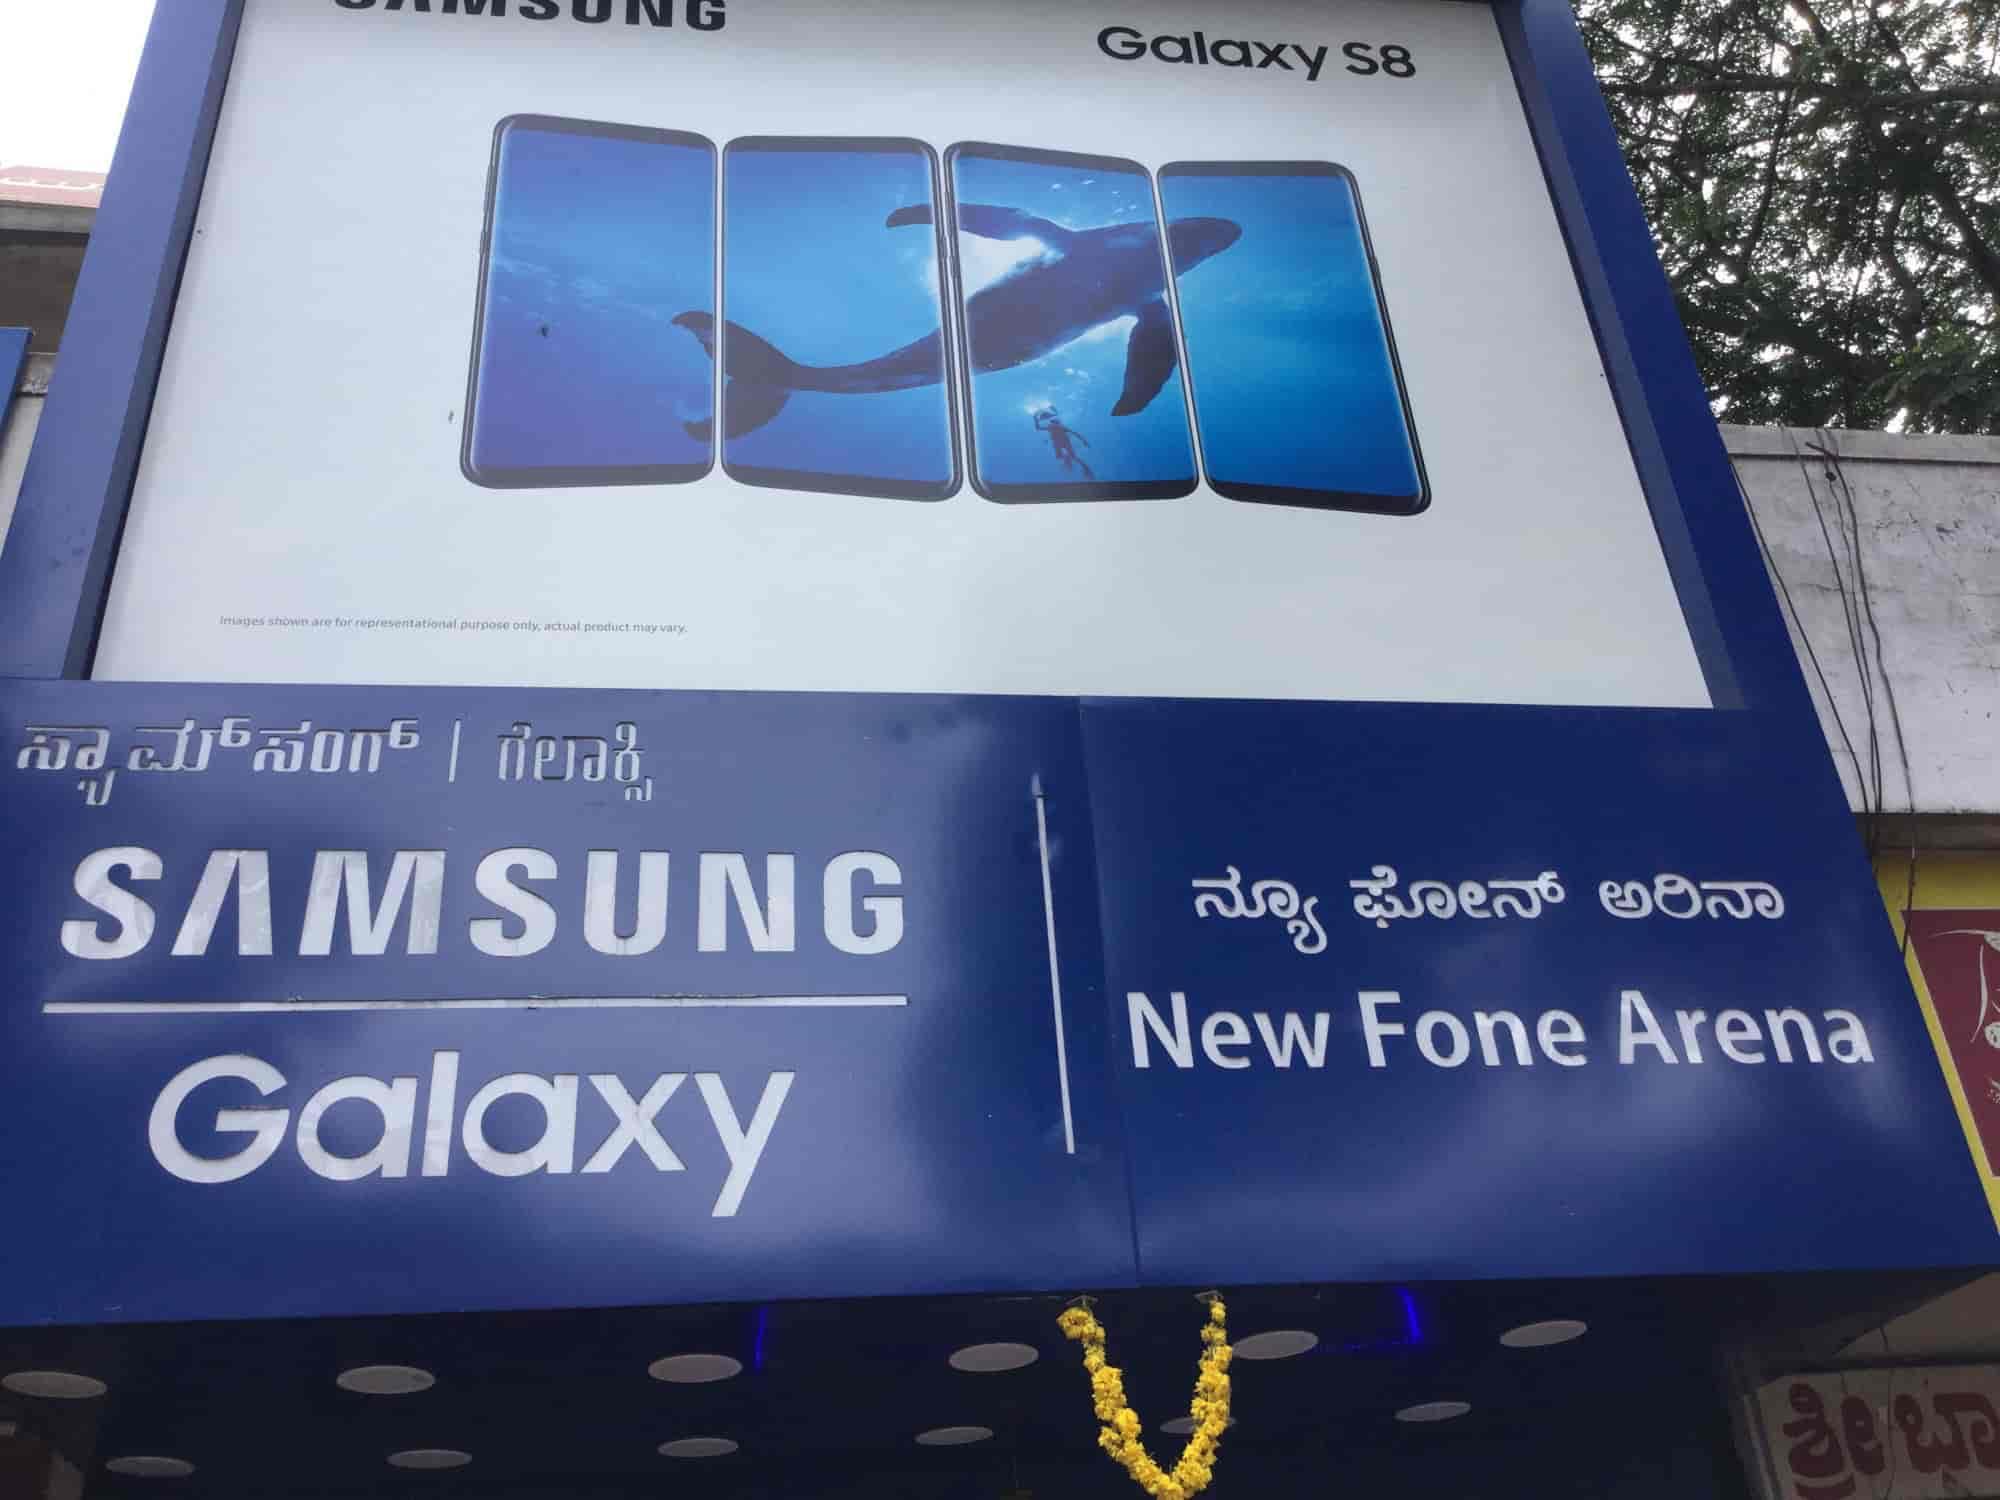 New Fone Arena, Vv Mohalla - Mobile Phone Dealers in Mysore